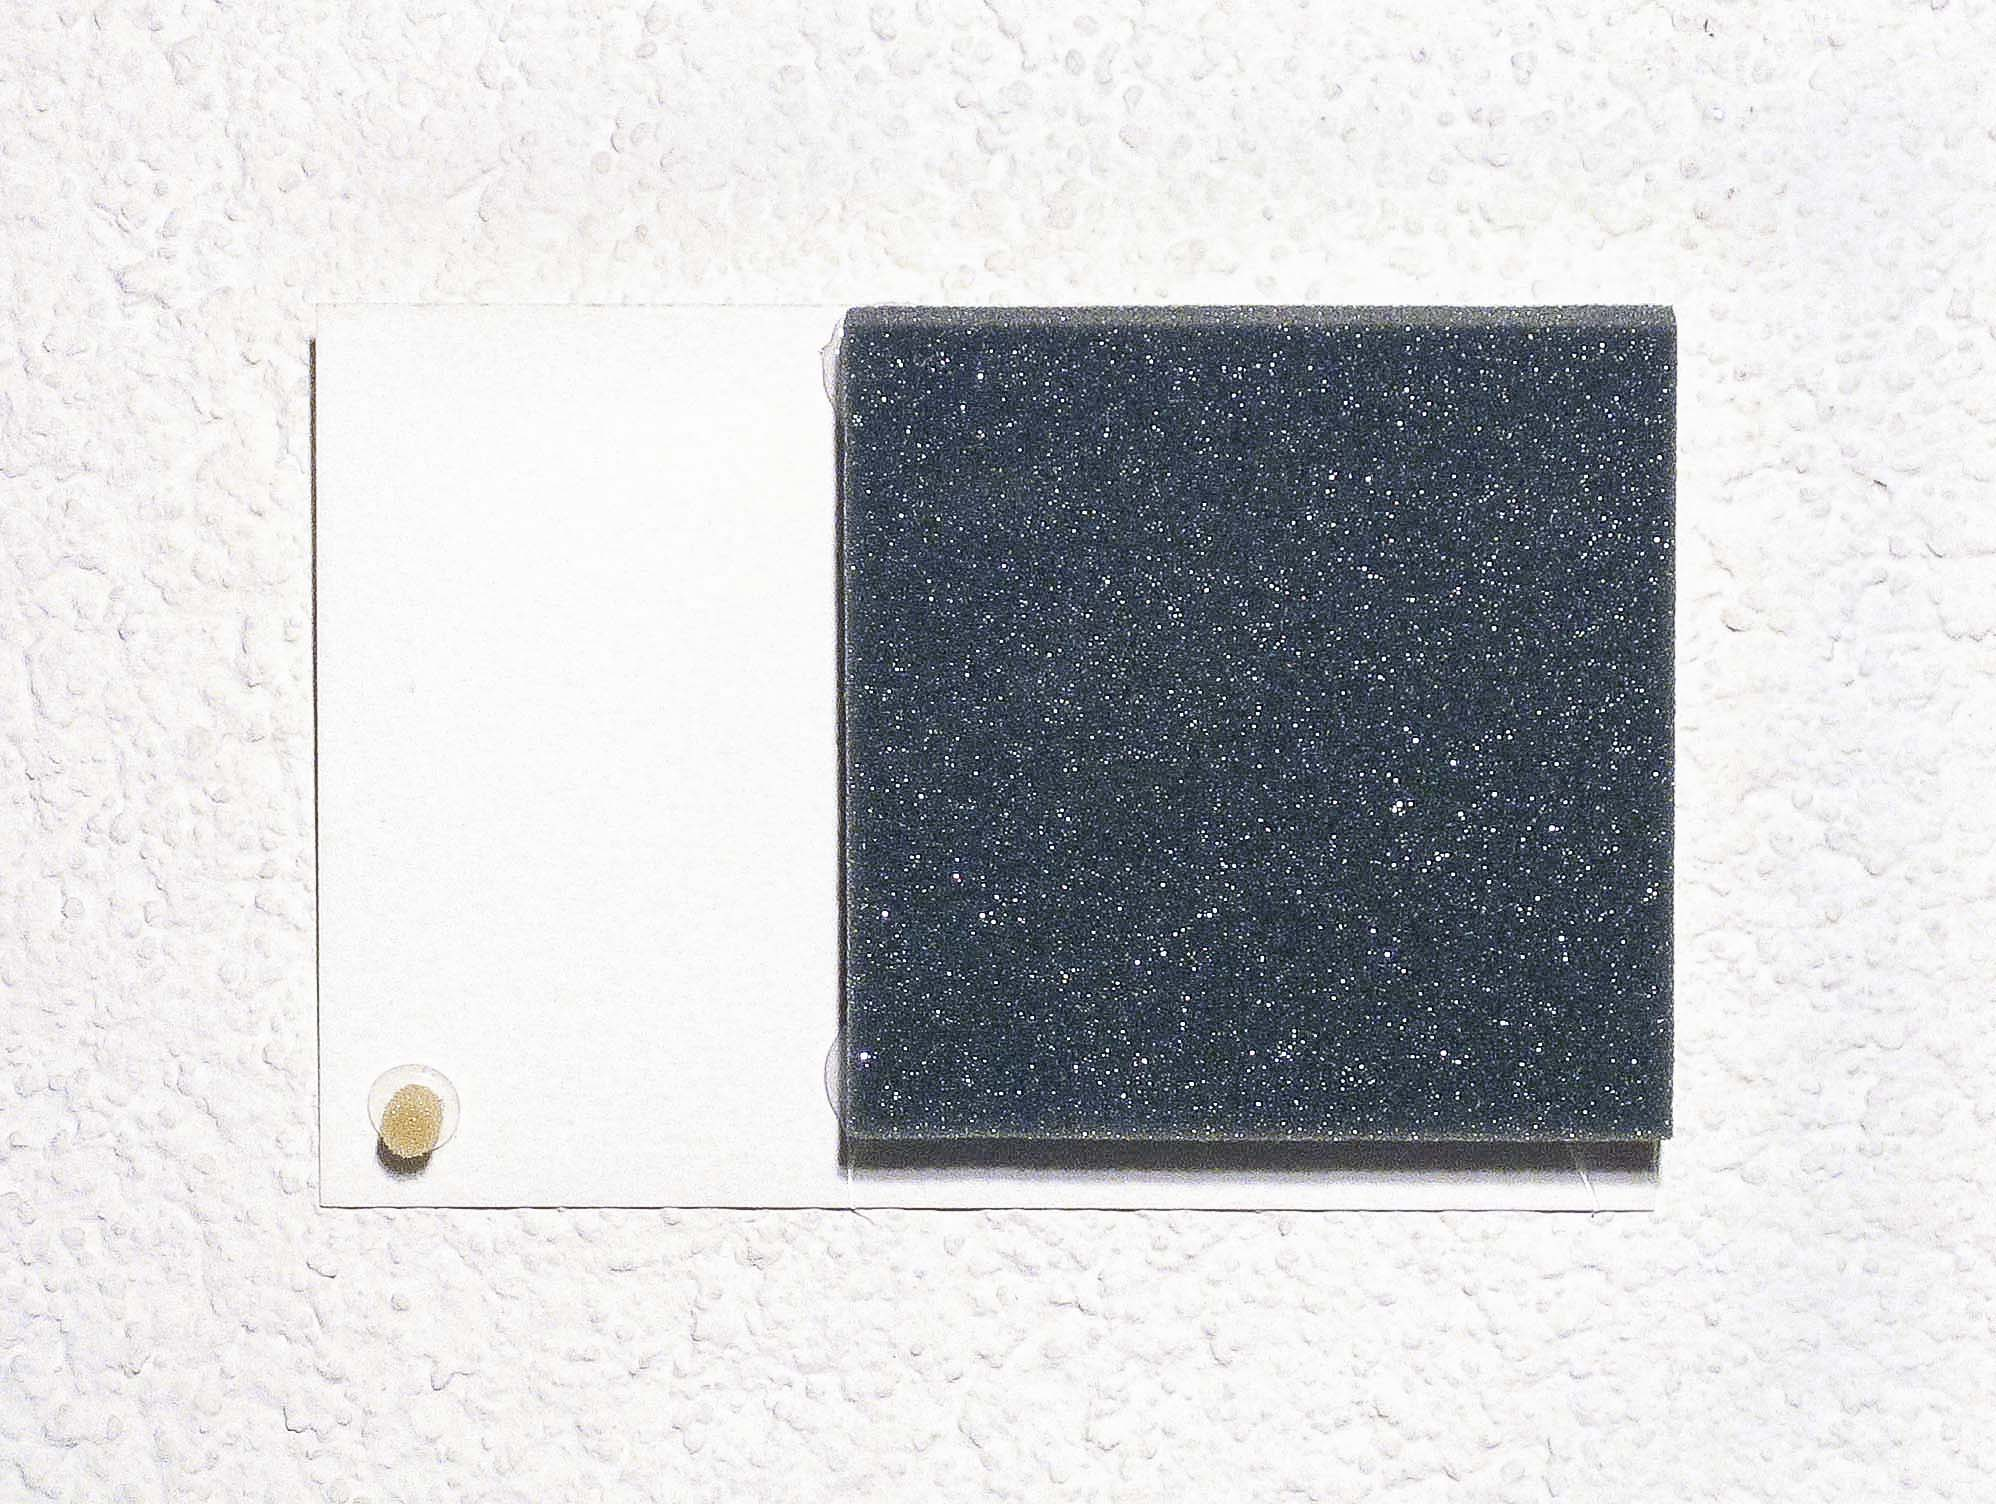 HS0135-9123